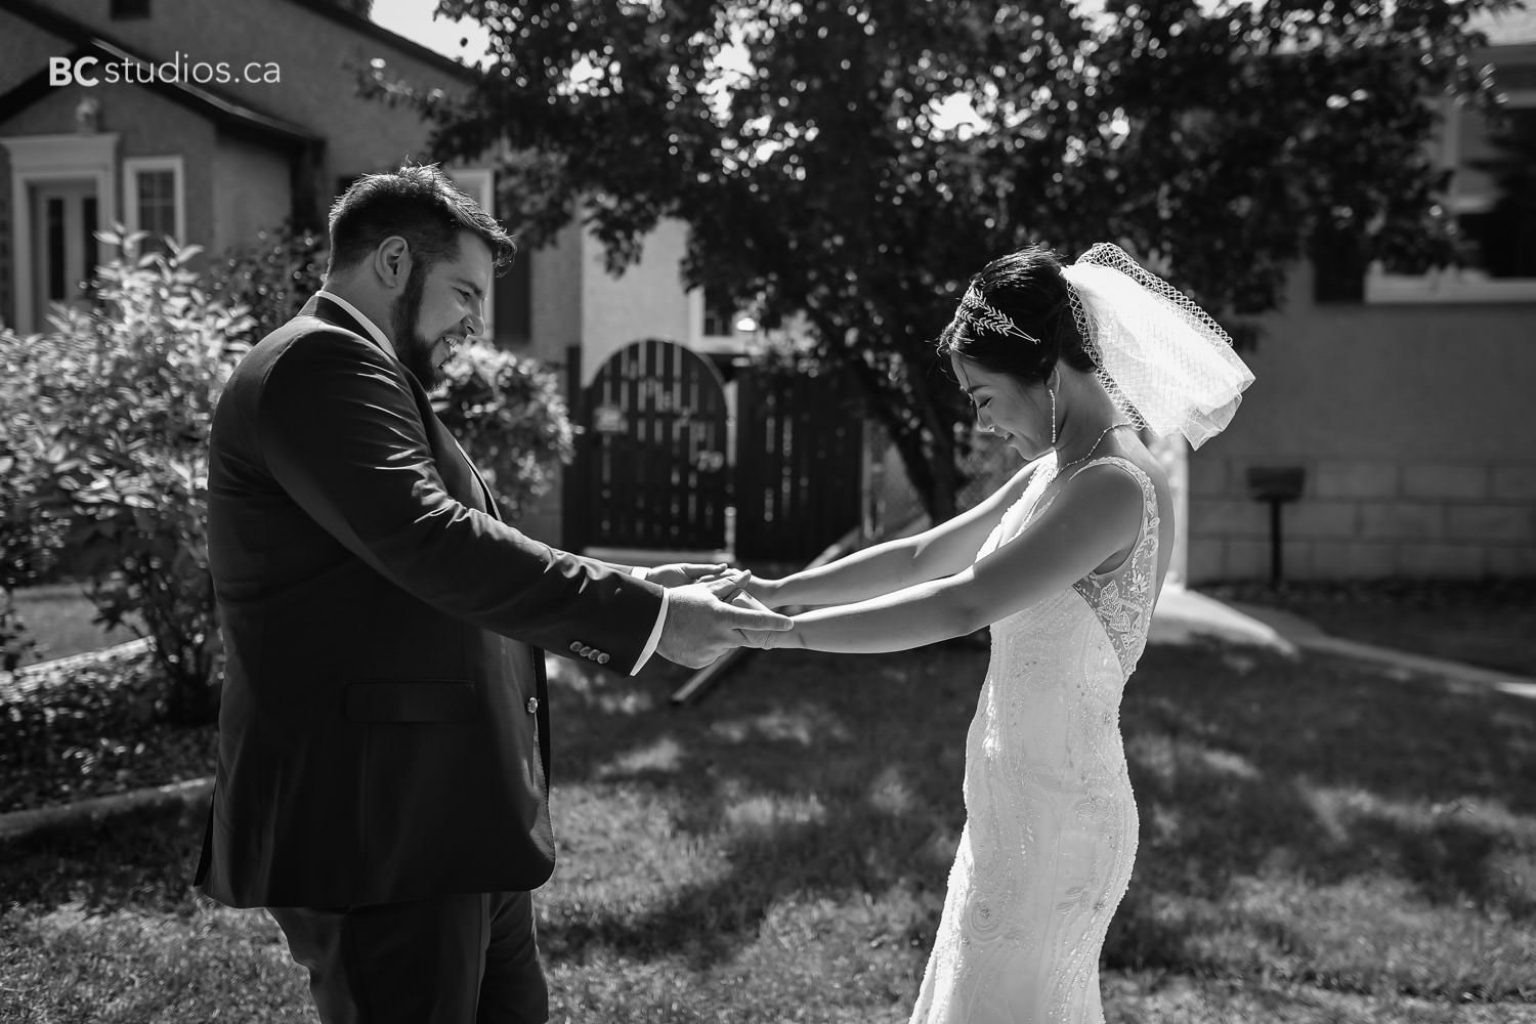 formal photos wedding at university of alberta. red brick wall. bride and groom. white dress.